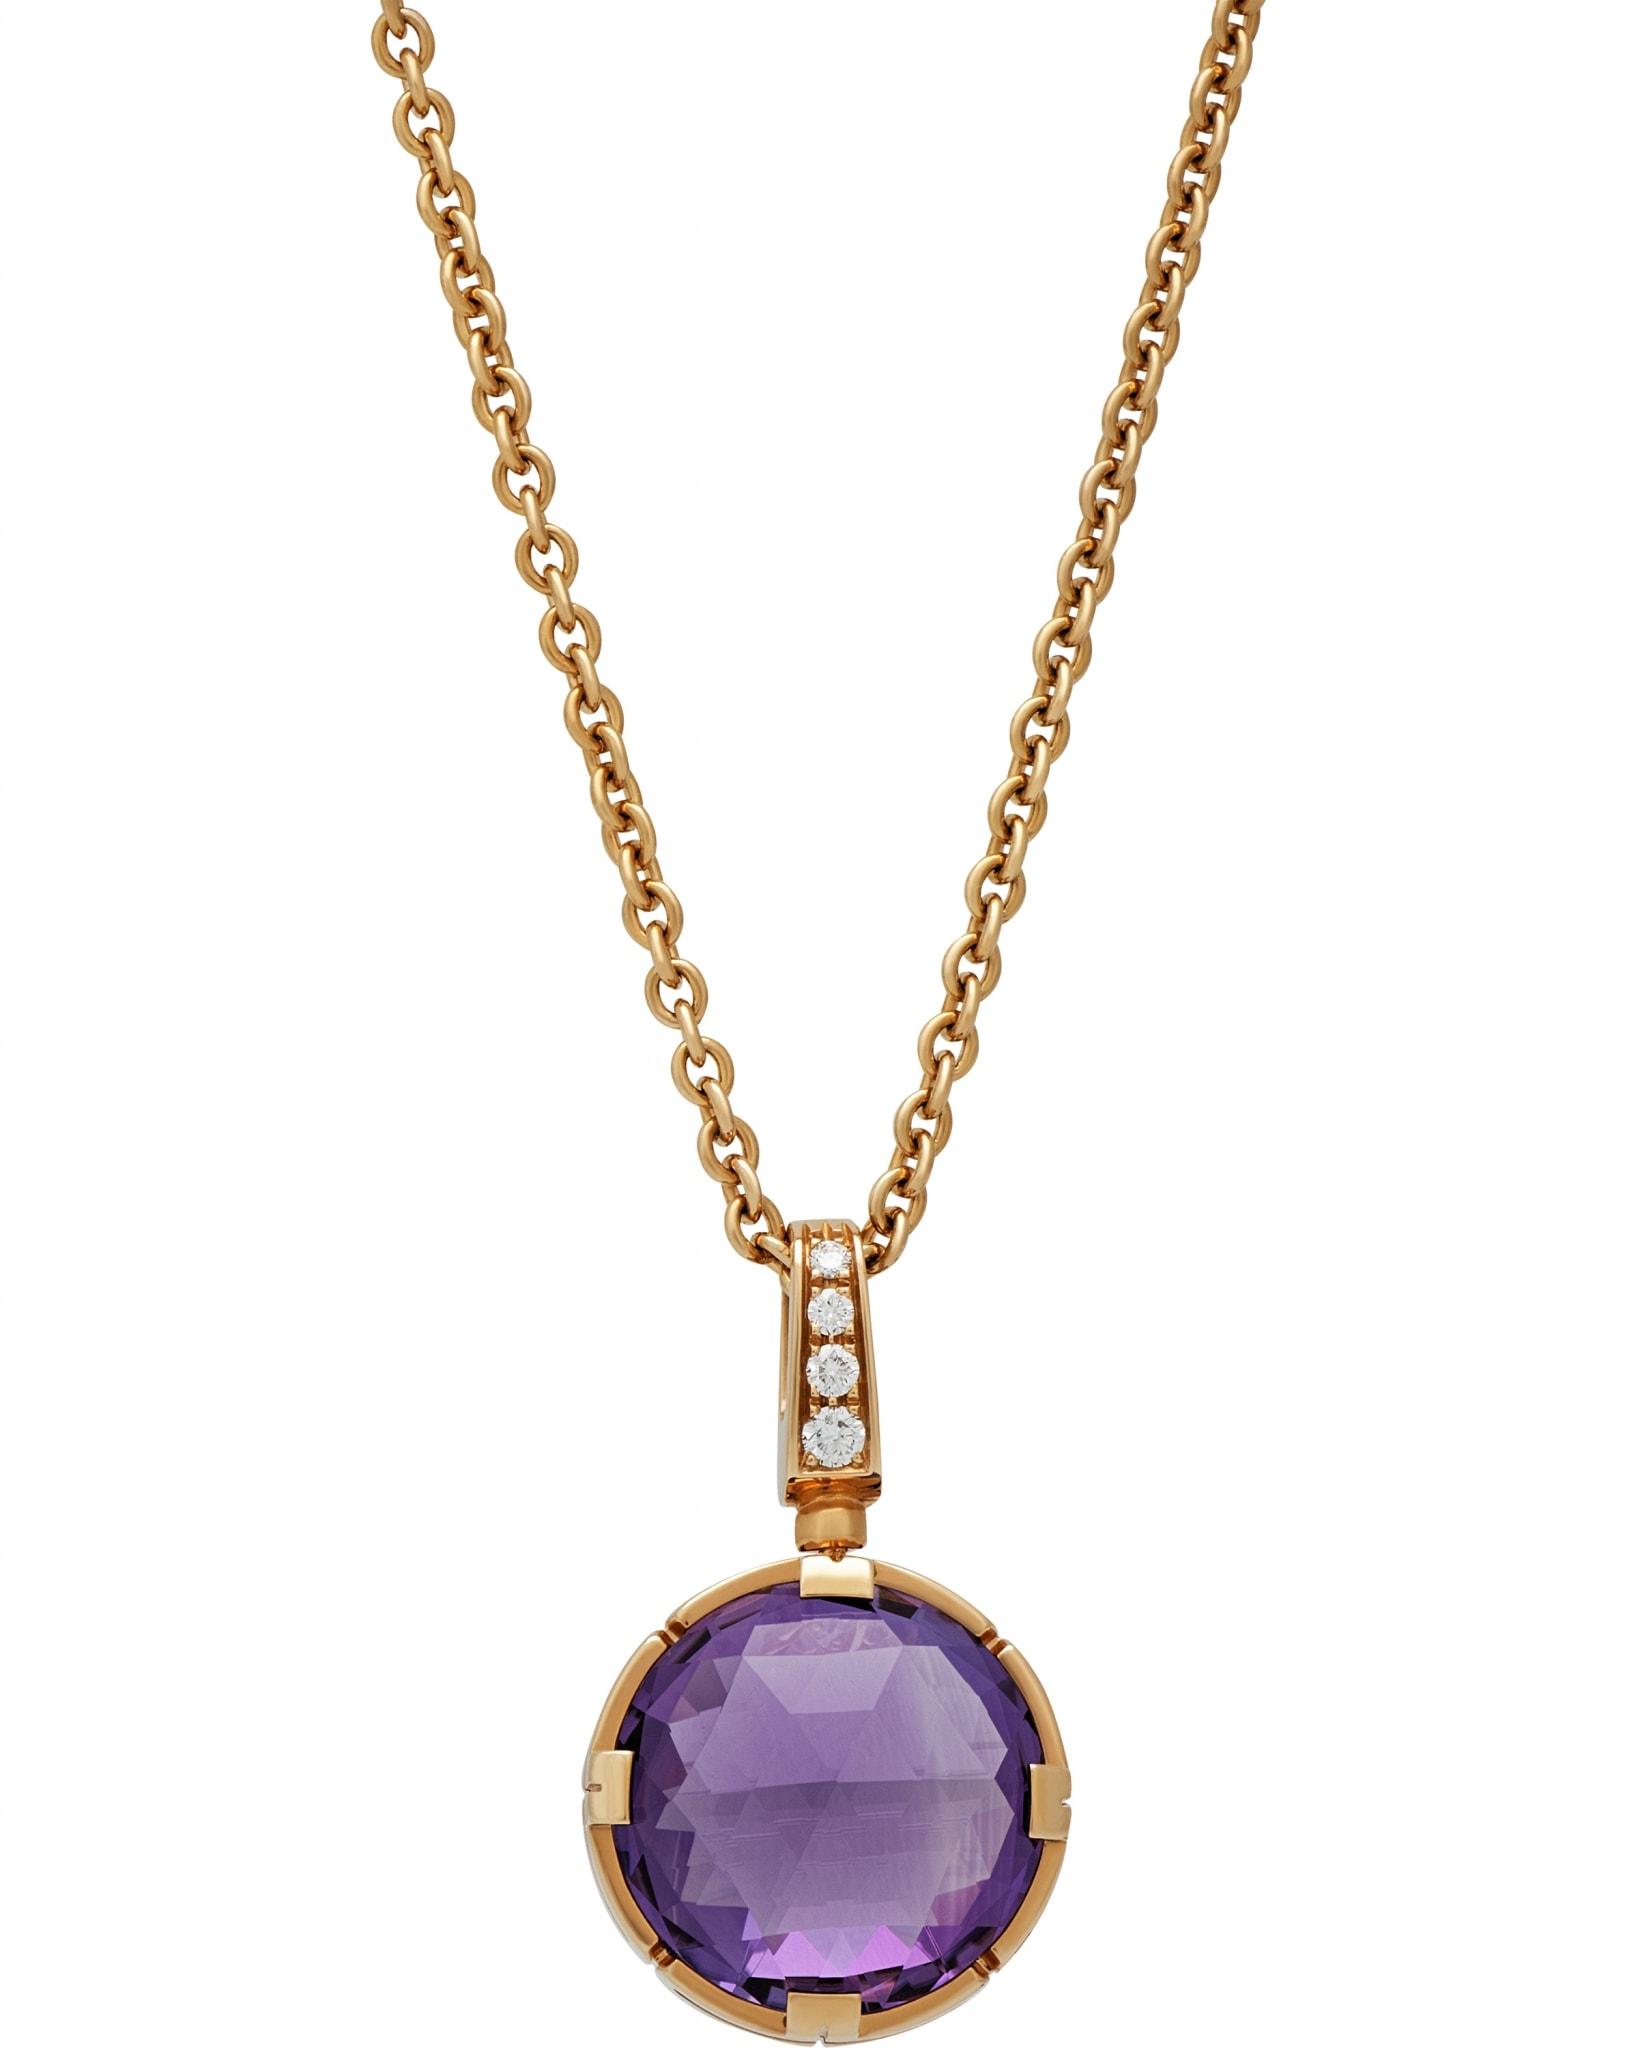 Bvlgari Parentesi Cocktail 18k Pink Gold Necklace, Amethyst, Pave Diamonds CL855241 344849